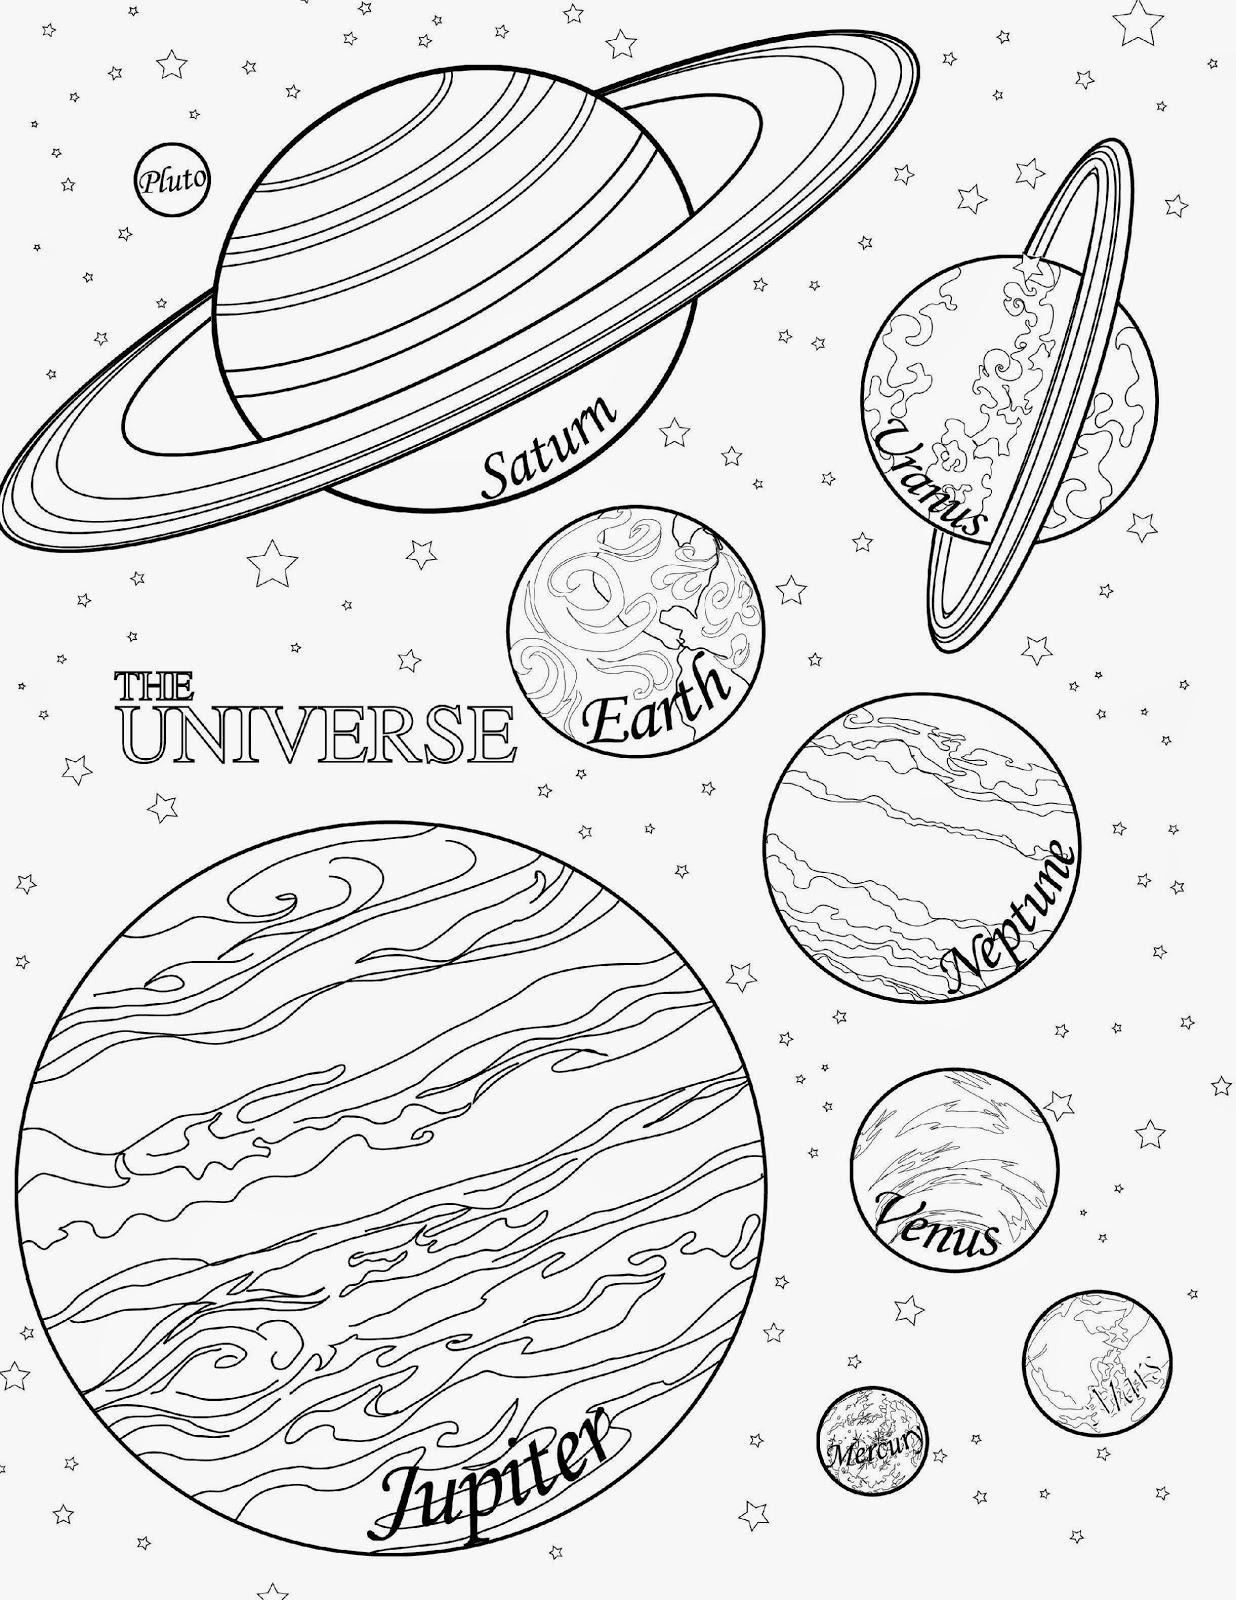 Venus Planet Coloring Pages Printable Sketch Coloring Page